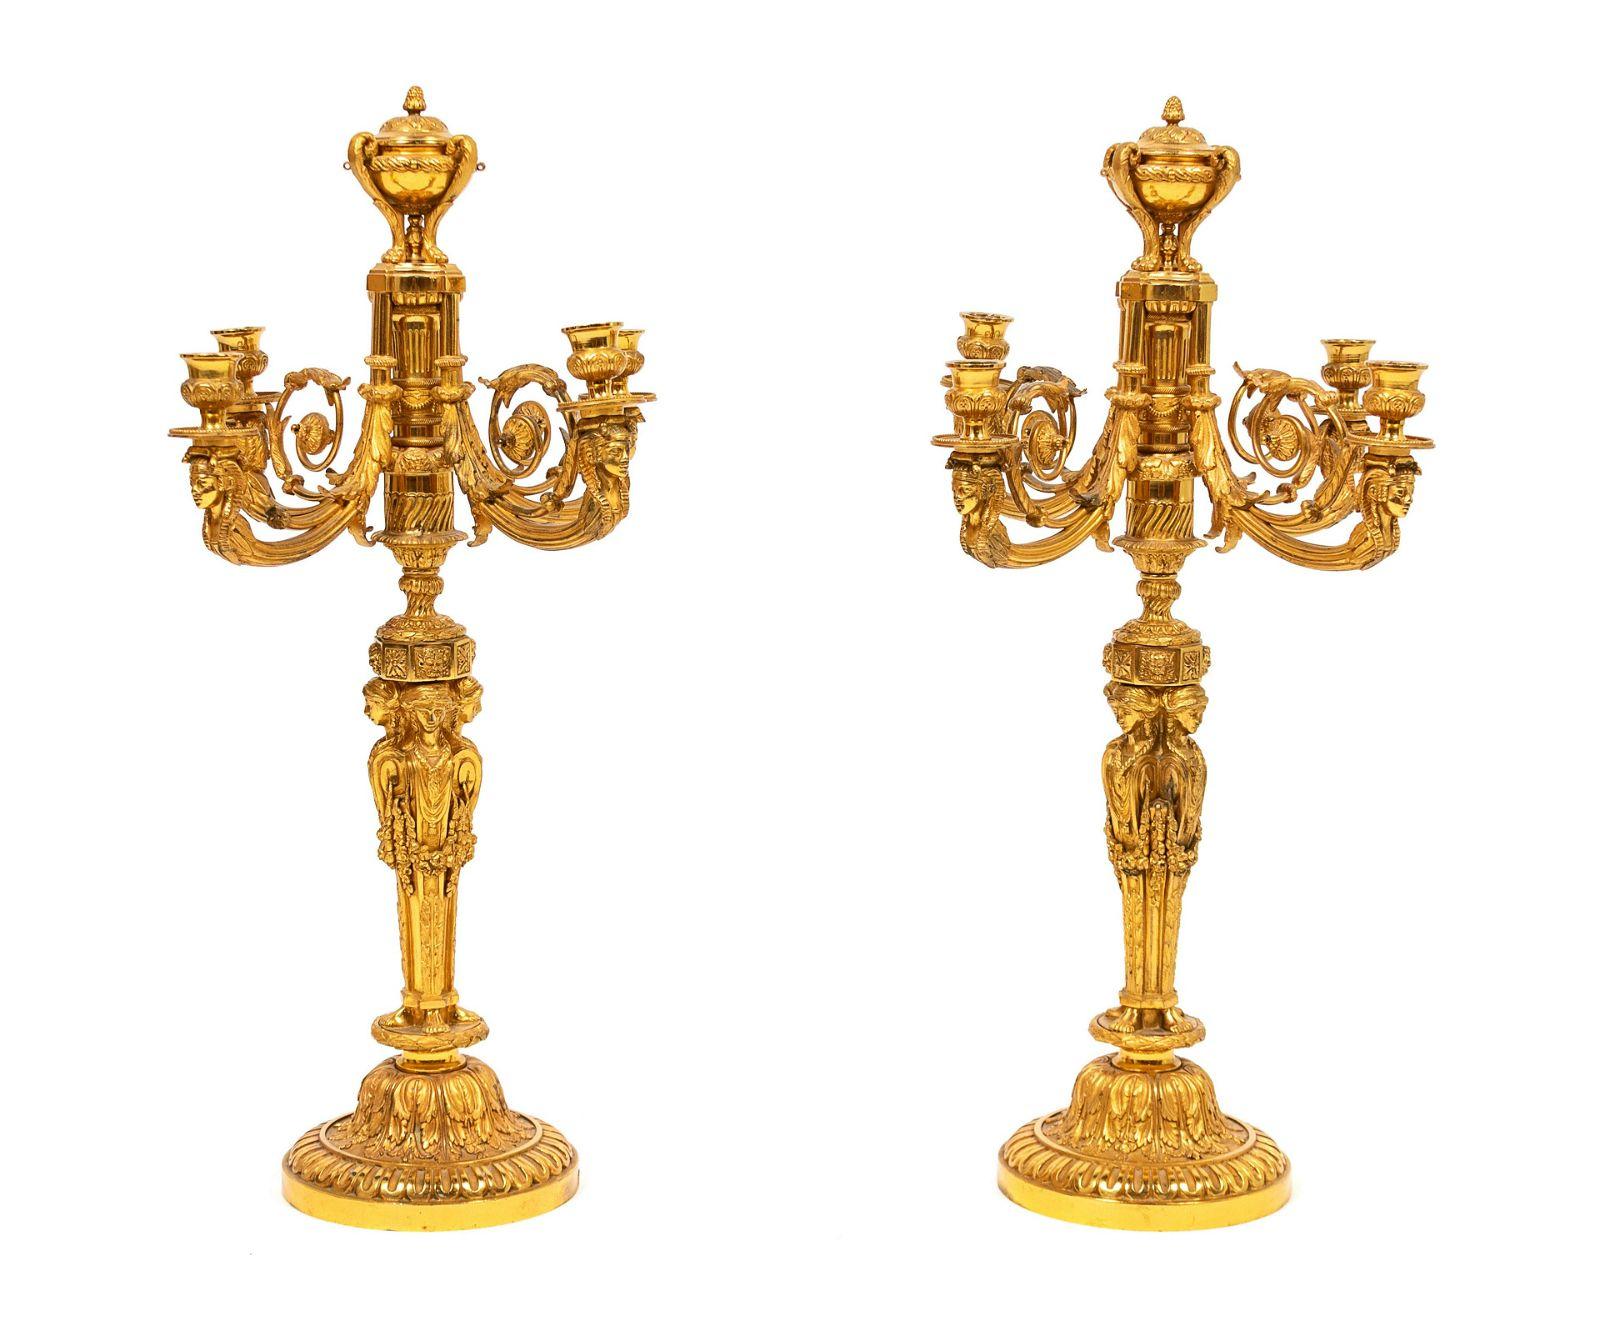 A Pair of Louis XVI Style Gilt-Bronze Four-Light